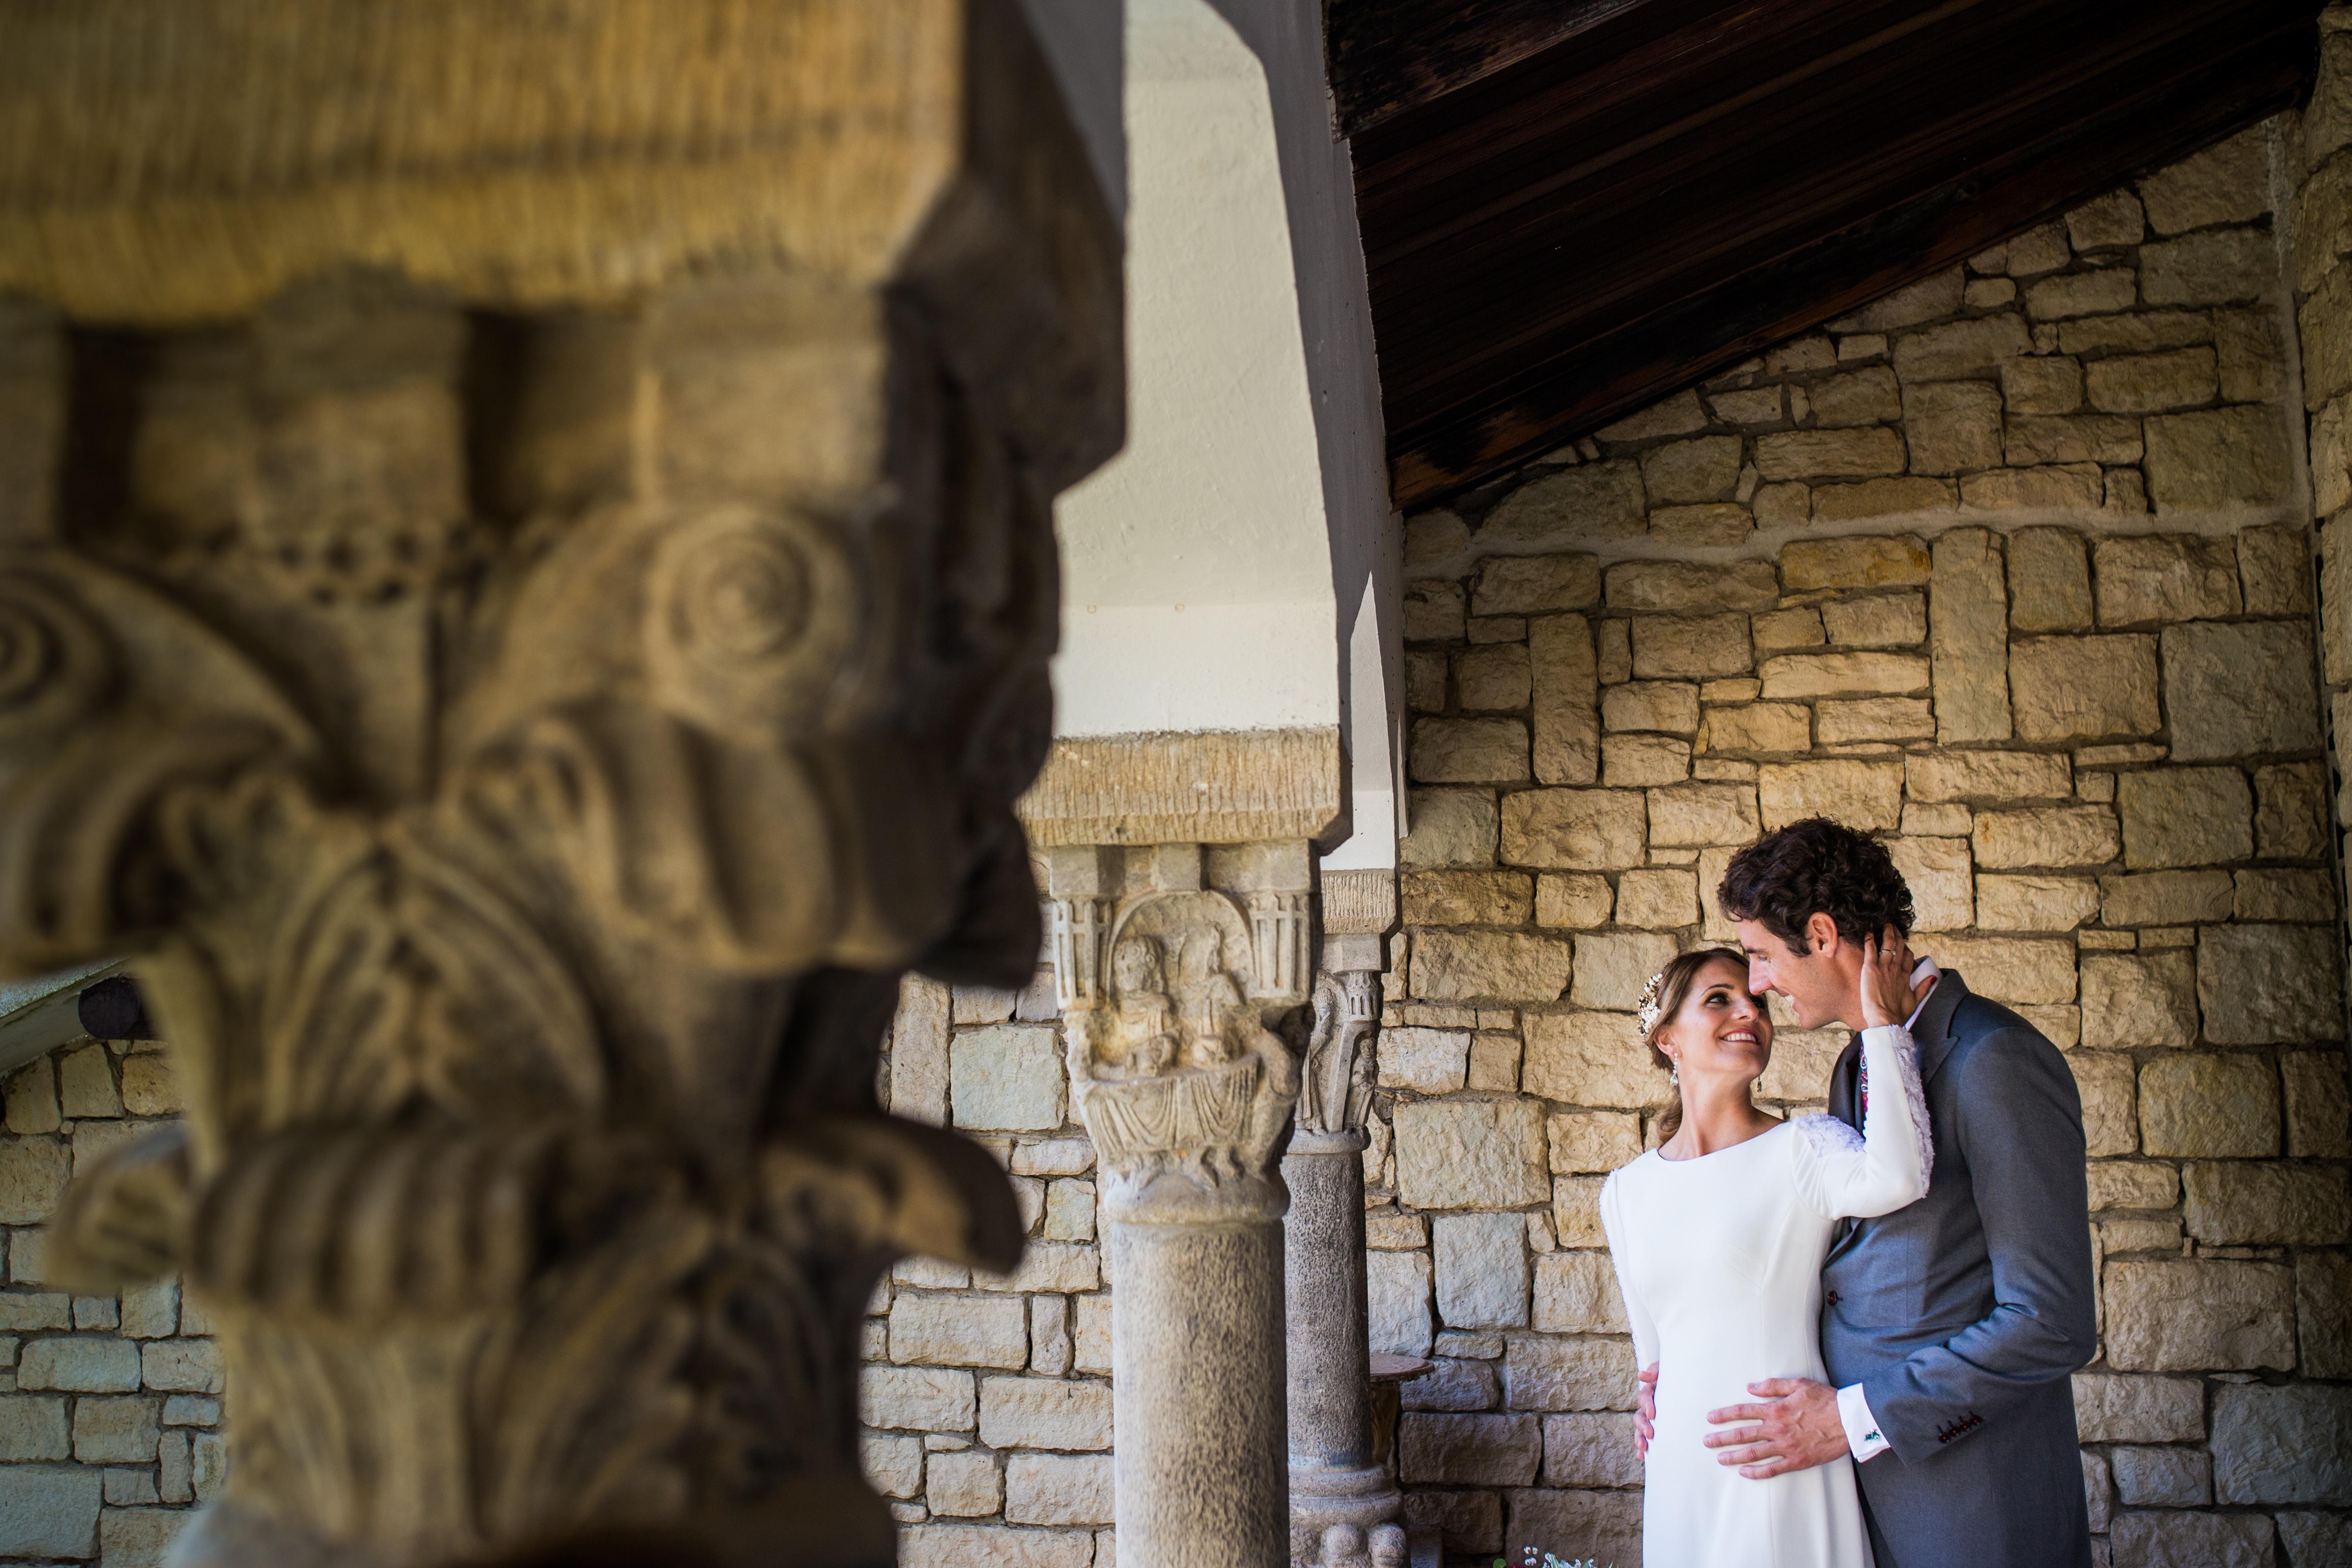 mandarina weddig, fotografos de boda, fotografo boda soria, fotografo boda barcelona, fotografo boda Madrid, fotografo boda lerida, fotografo boda Huesca_01